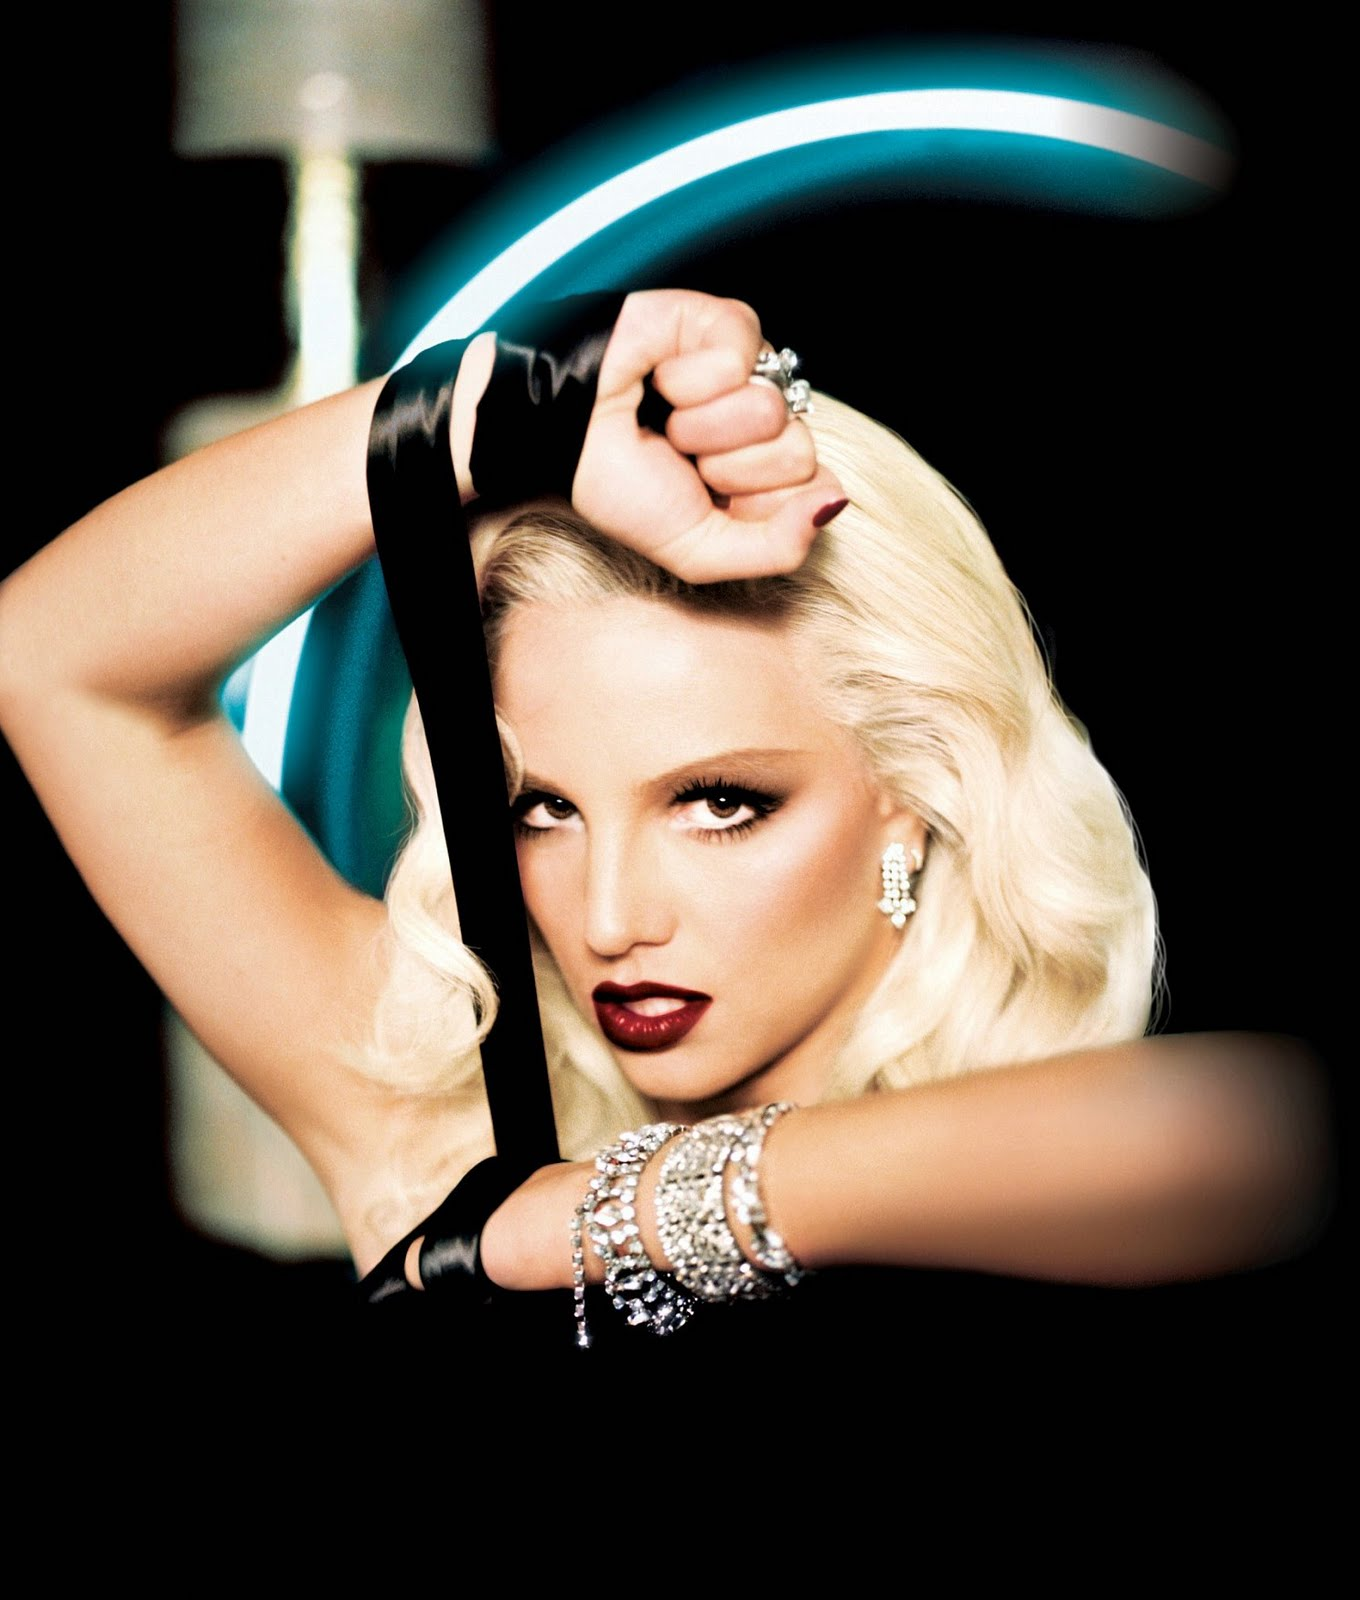 http://4.bp.blogspot.com/-r5sDJy08ATc/Tk1-mVfTBfI/AAAAAAAAhE4/iXP0TZfxE2c/s1600/Britney%2BSpearsDavid%2BLaChapelle.jpg